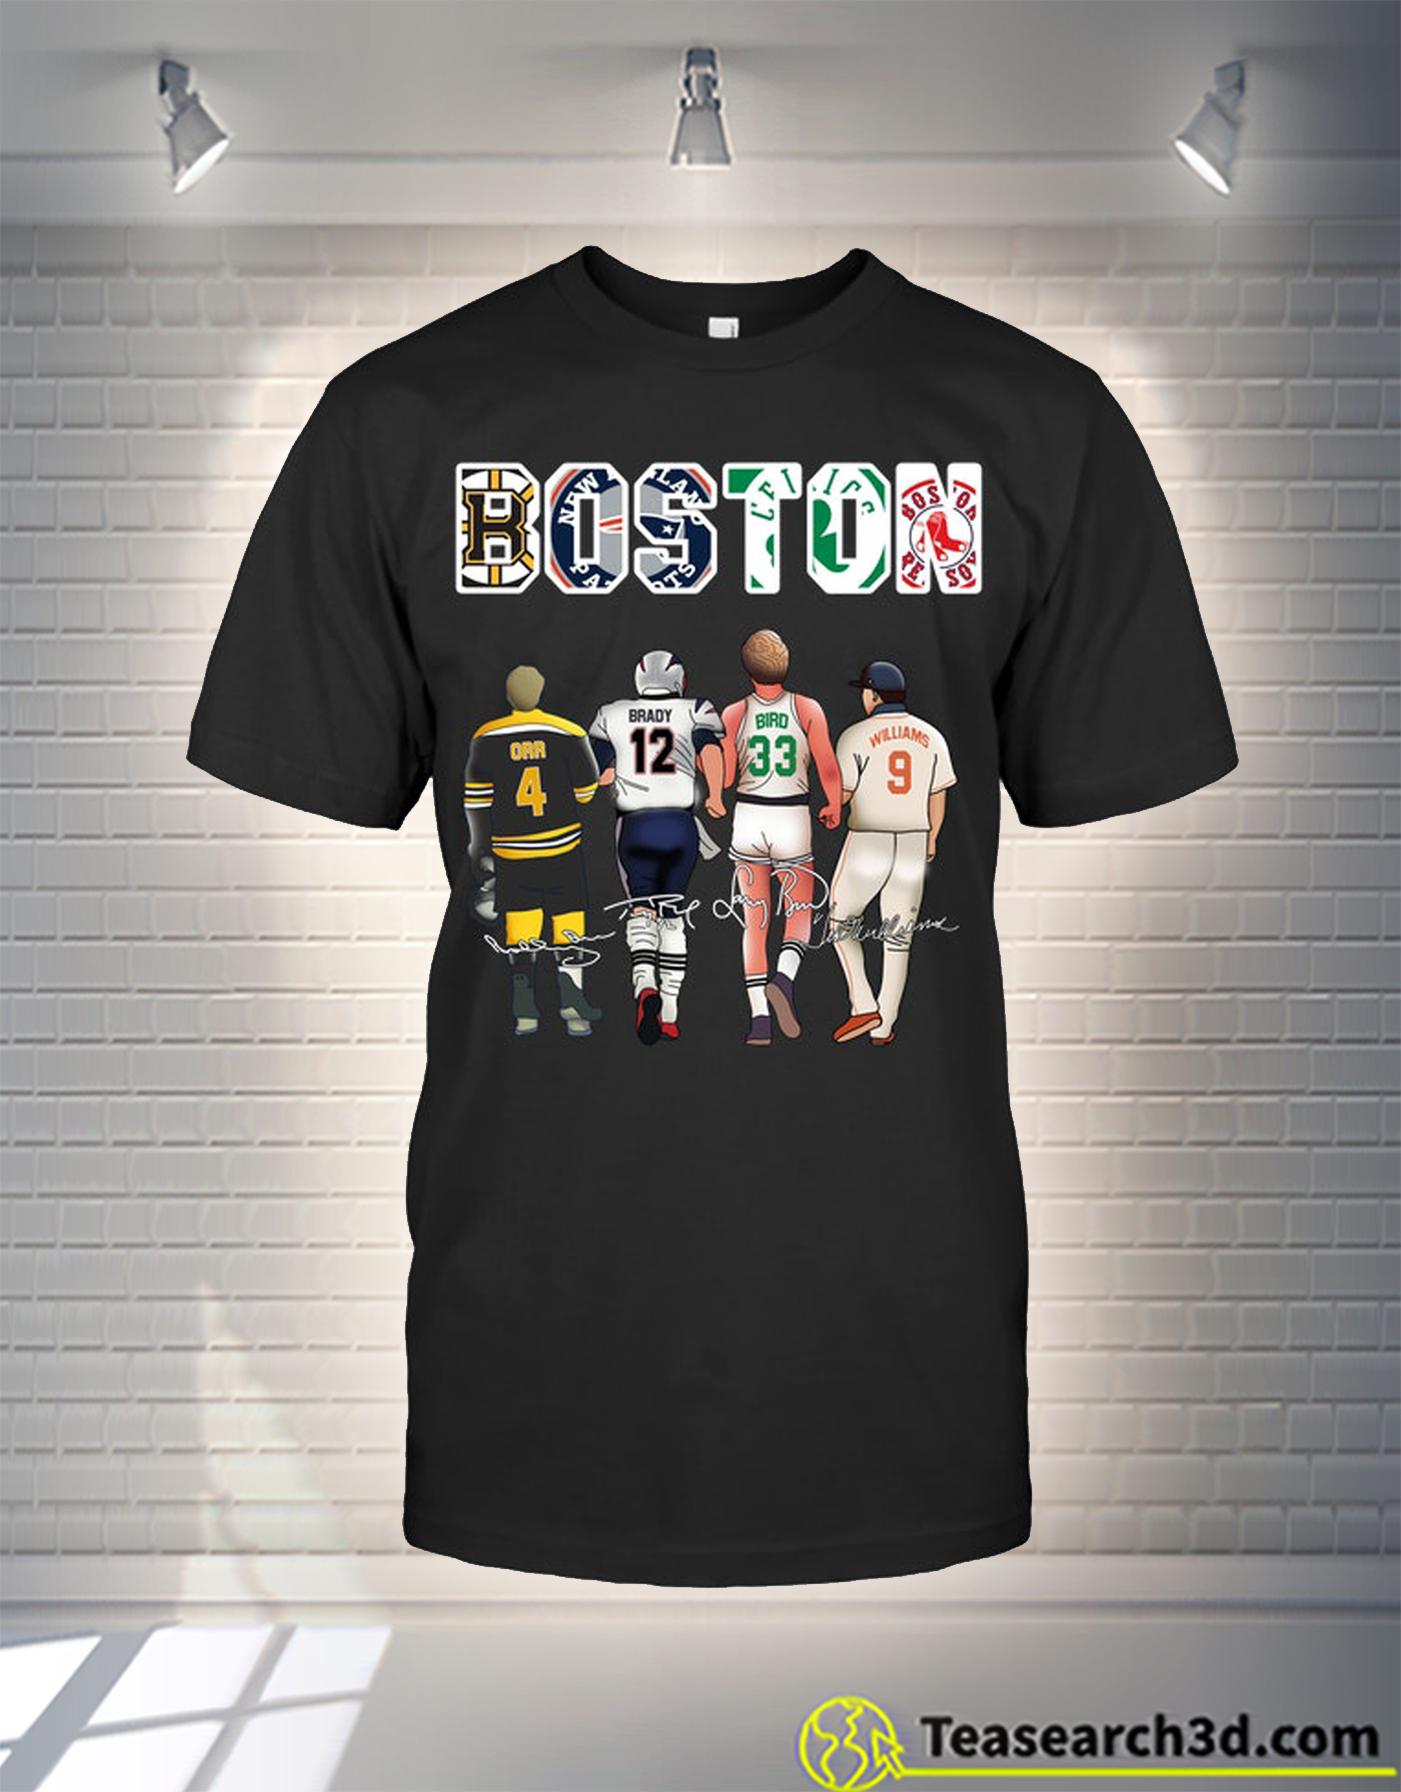 Boston players orr brady bird williams t-shirt